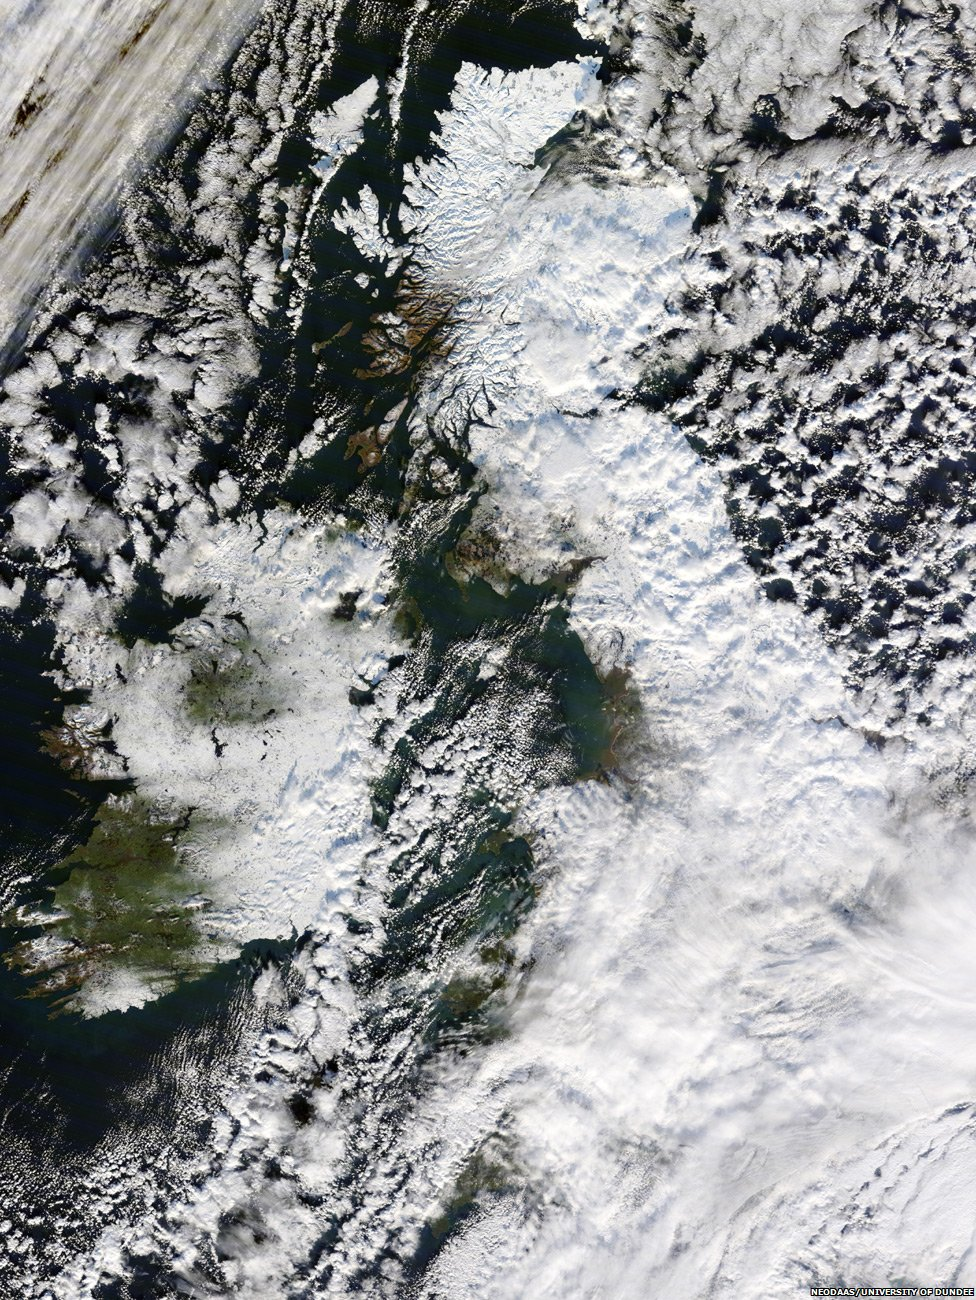 NASA image of snow covered UK in December 2010